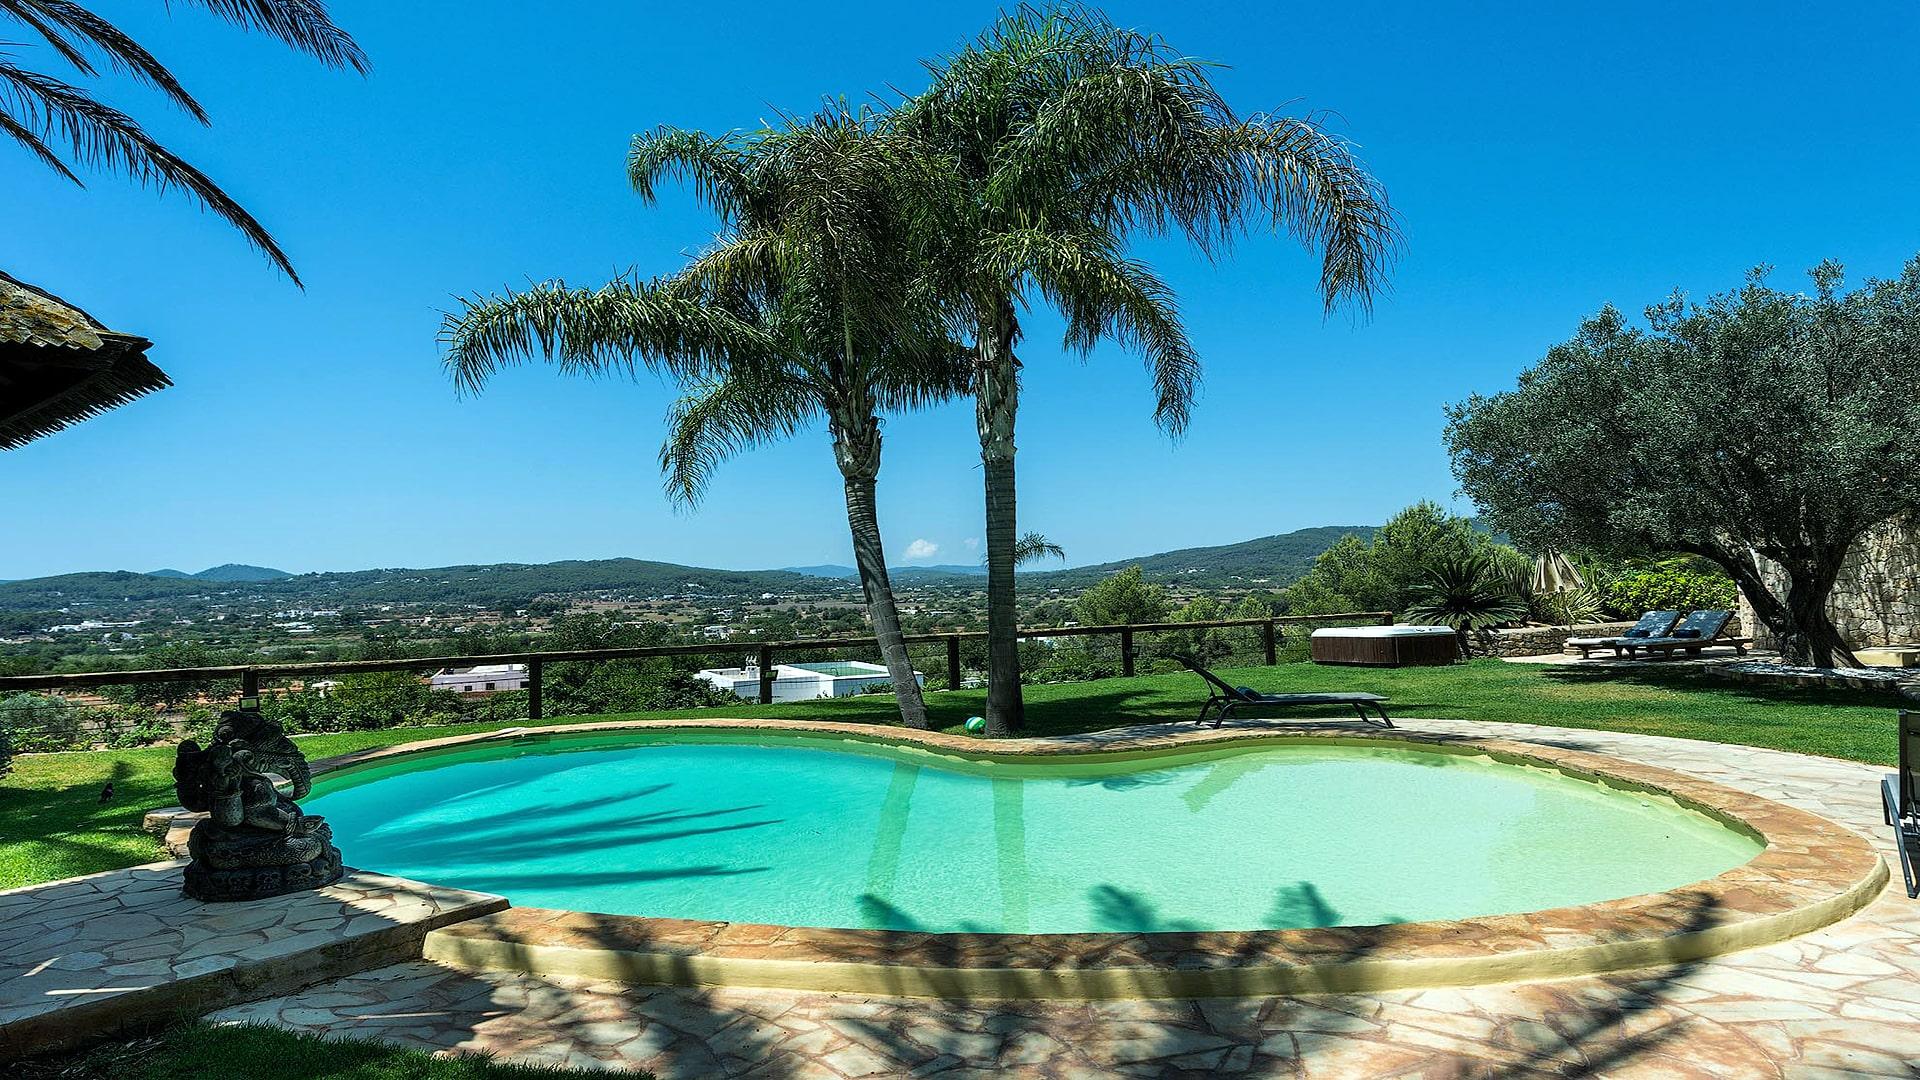 Casa Beni Ibiza 2 Santa Eulalia